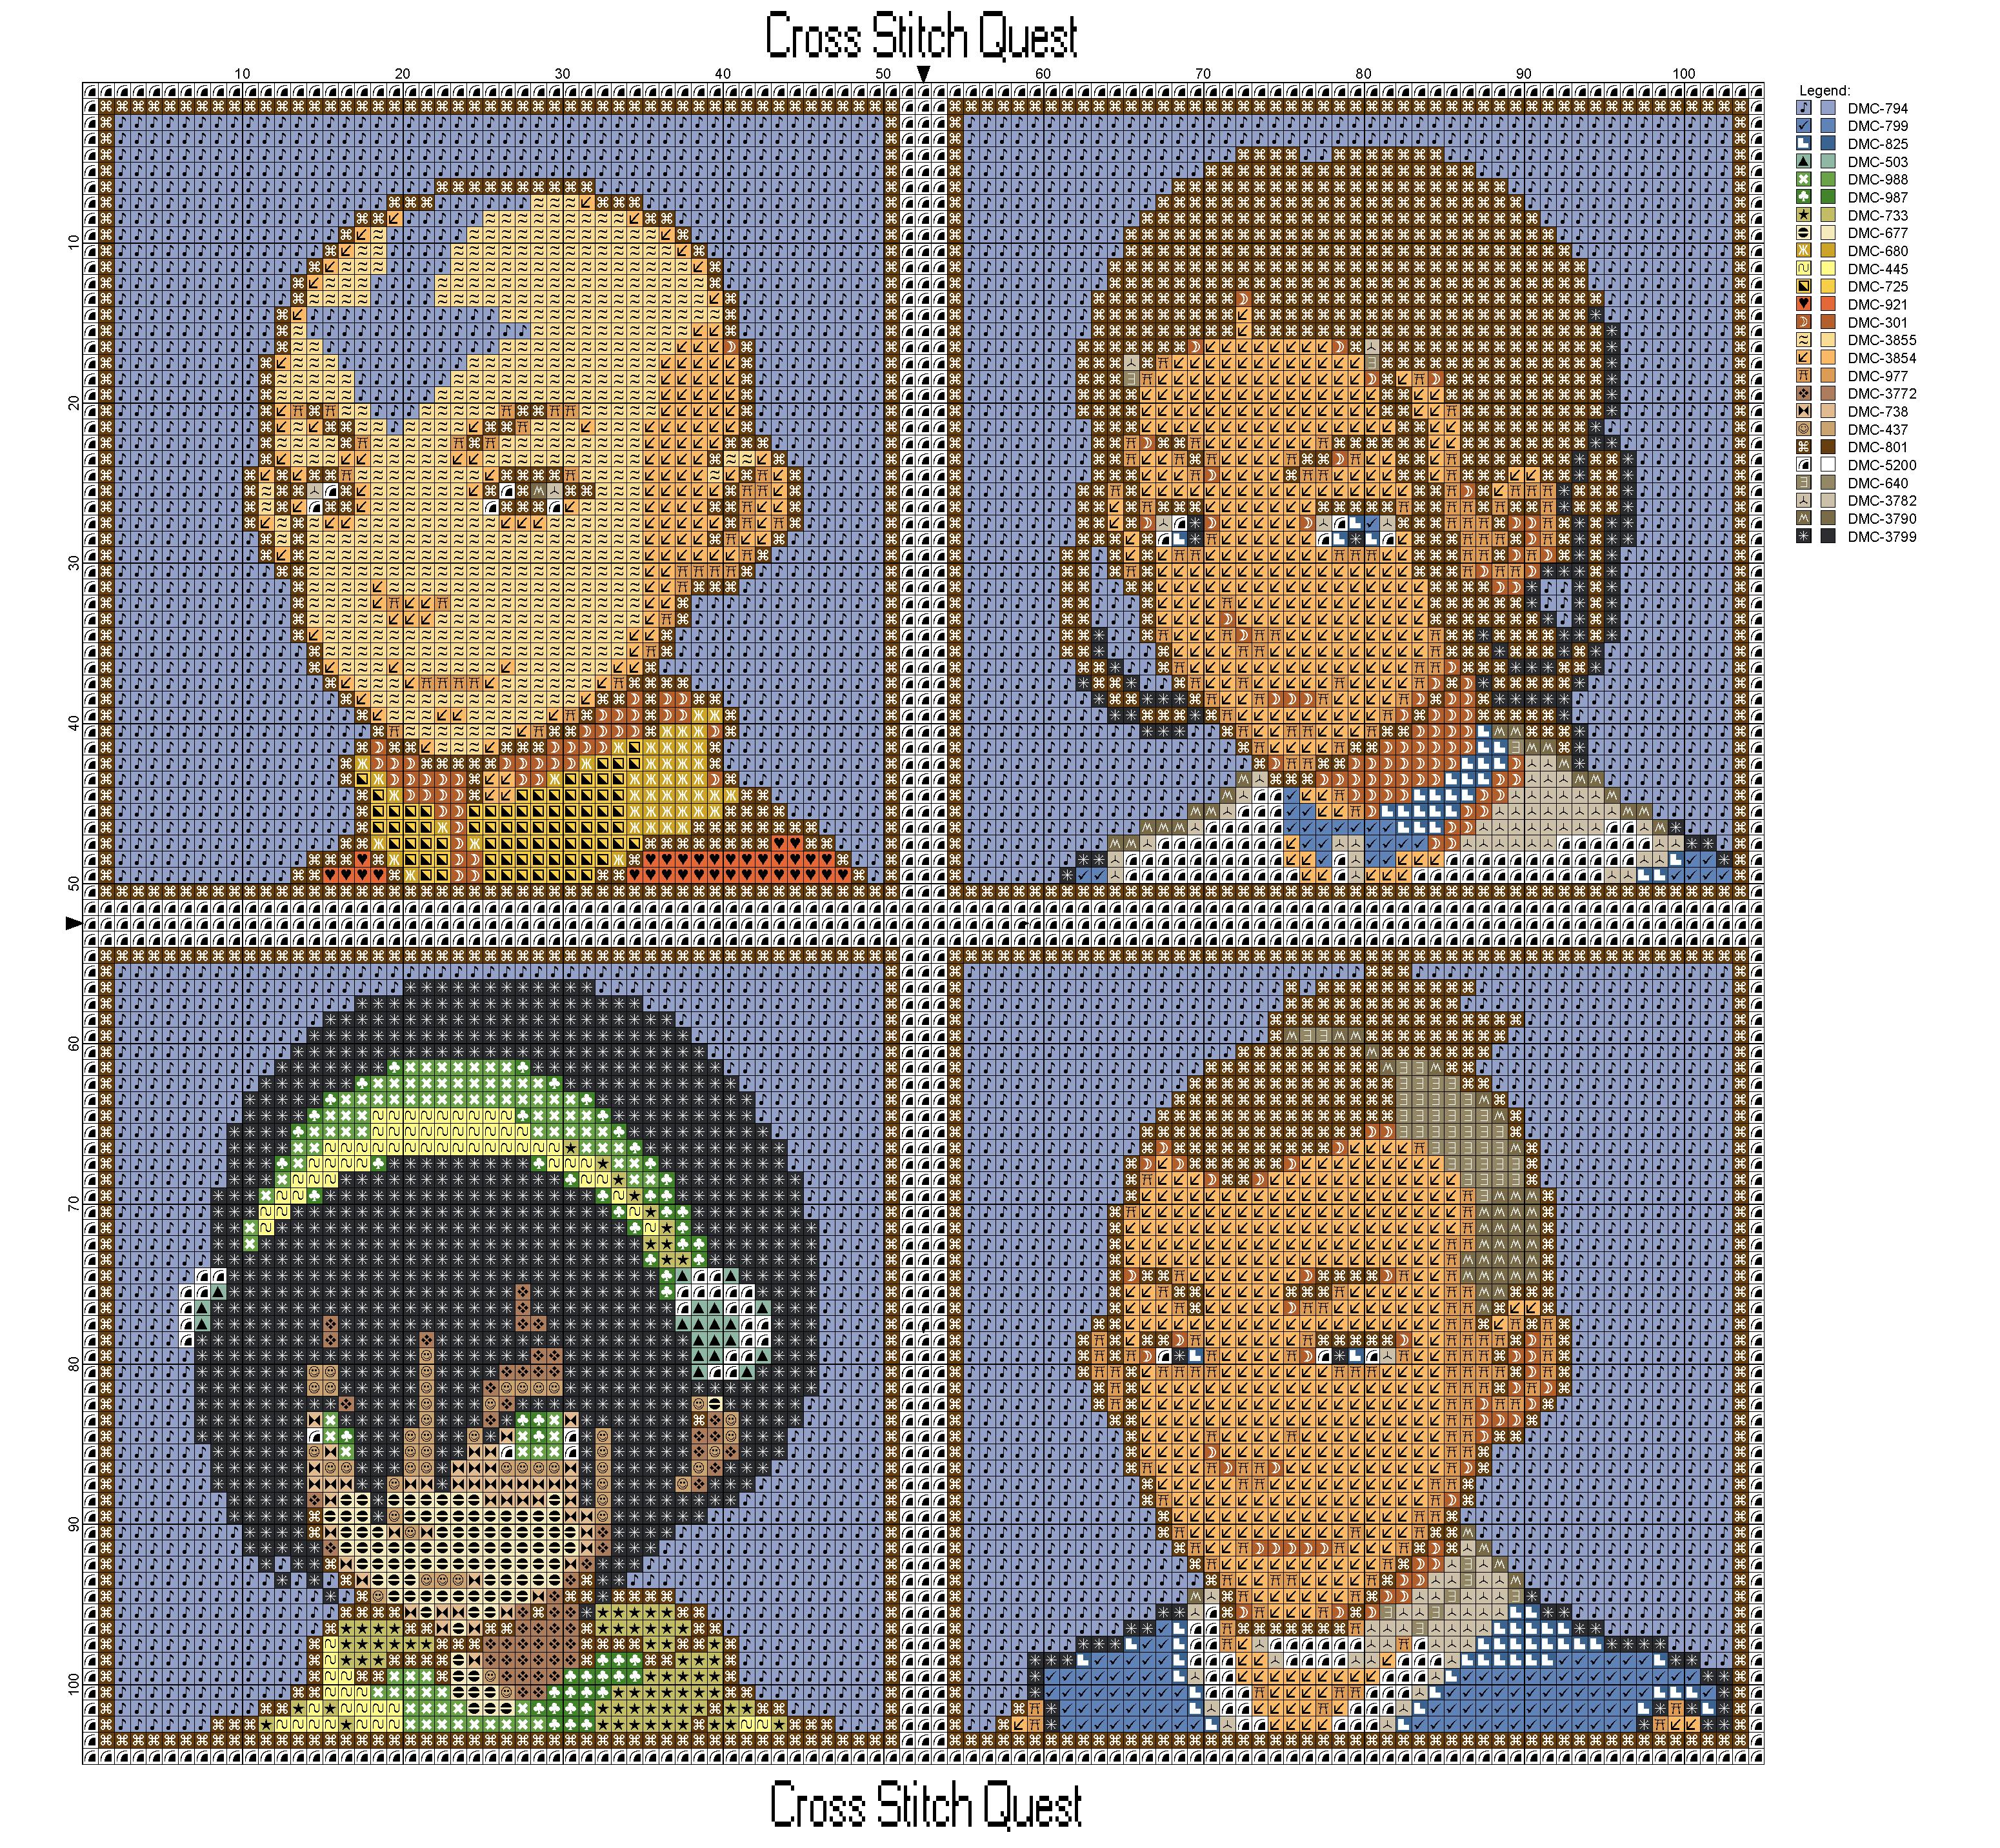 Avatar Cast Pattern Page 1